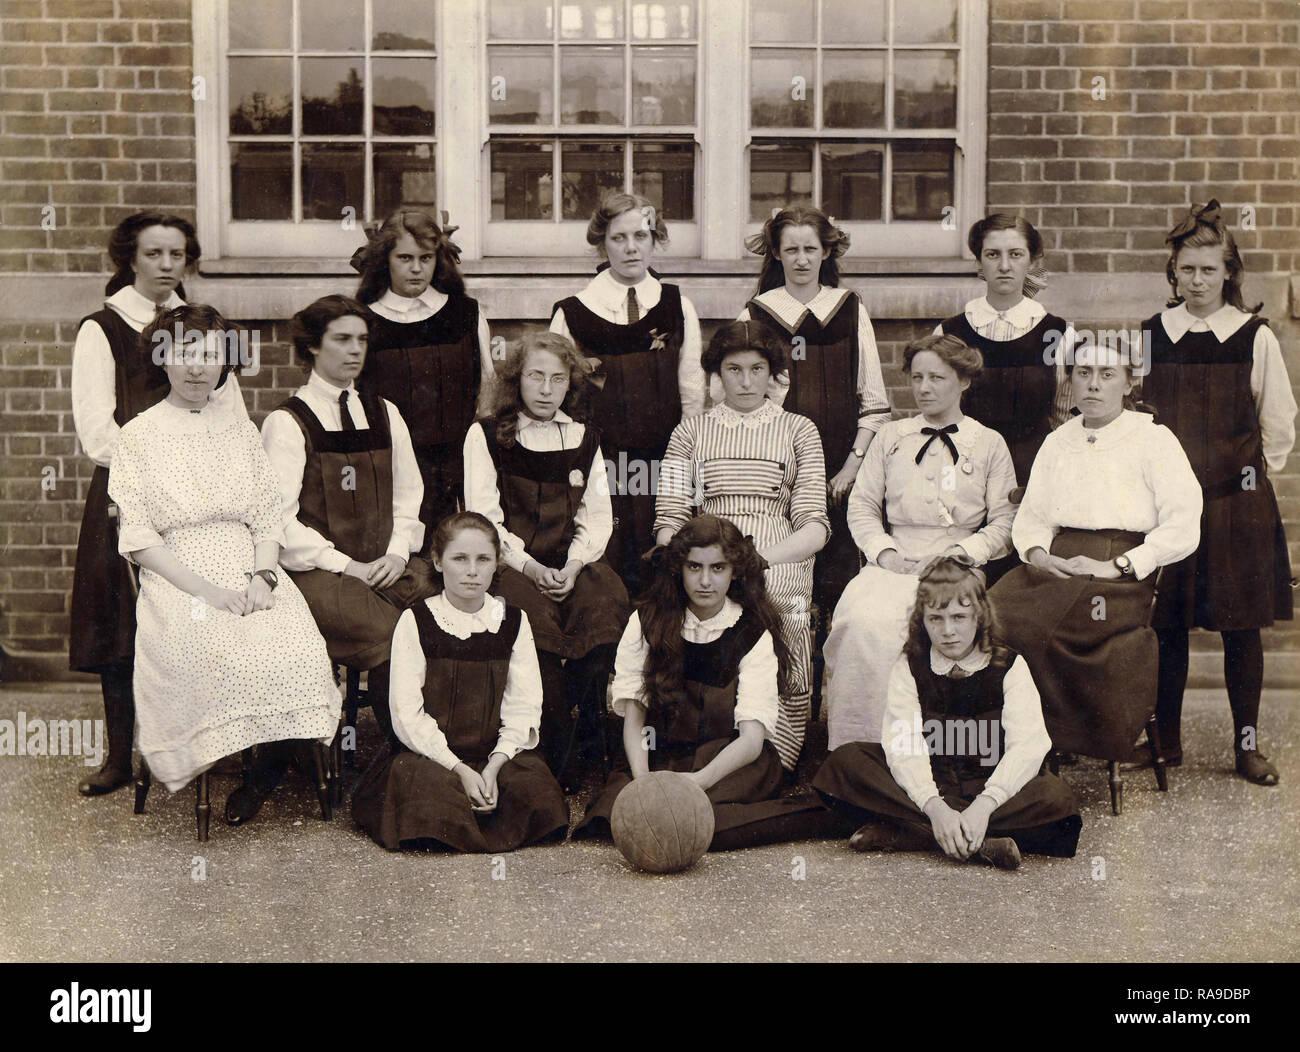 Historic Archive Image of girl's school c1910s - Stock Image